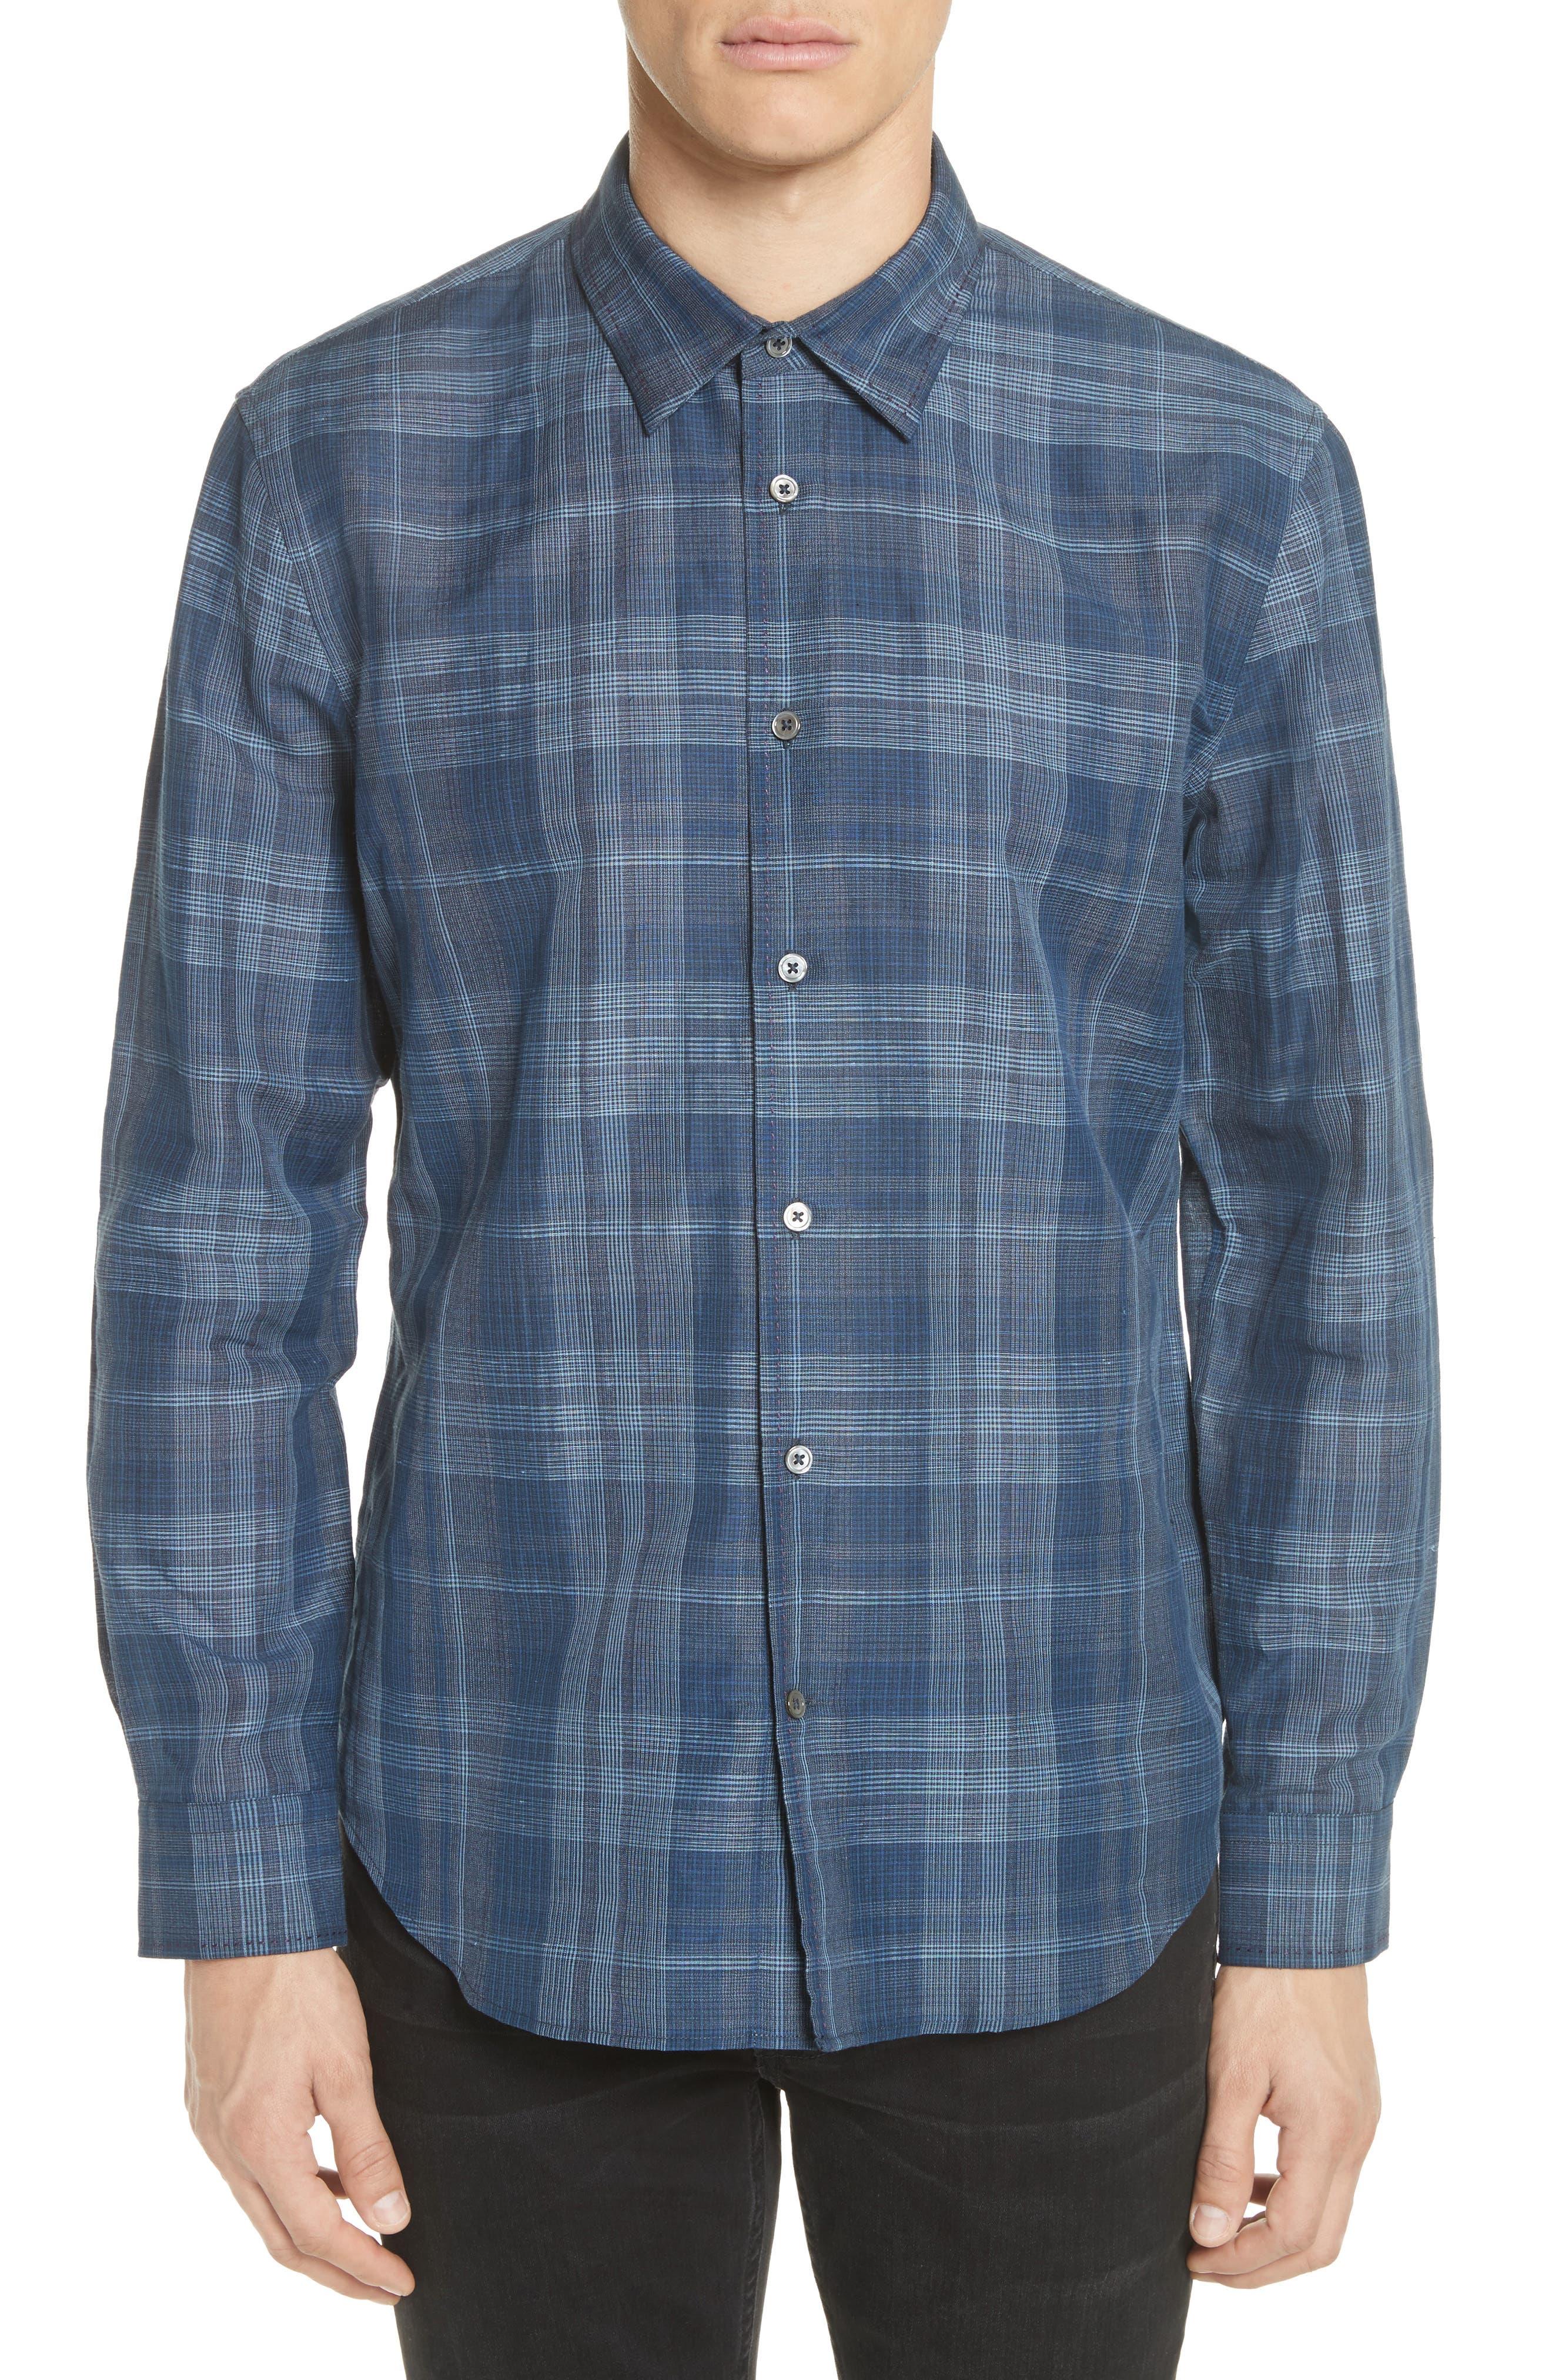 John Varvatos Classic Fit Plaid Linen Blend Shirt